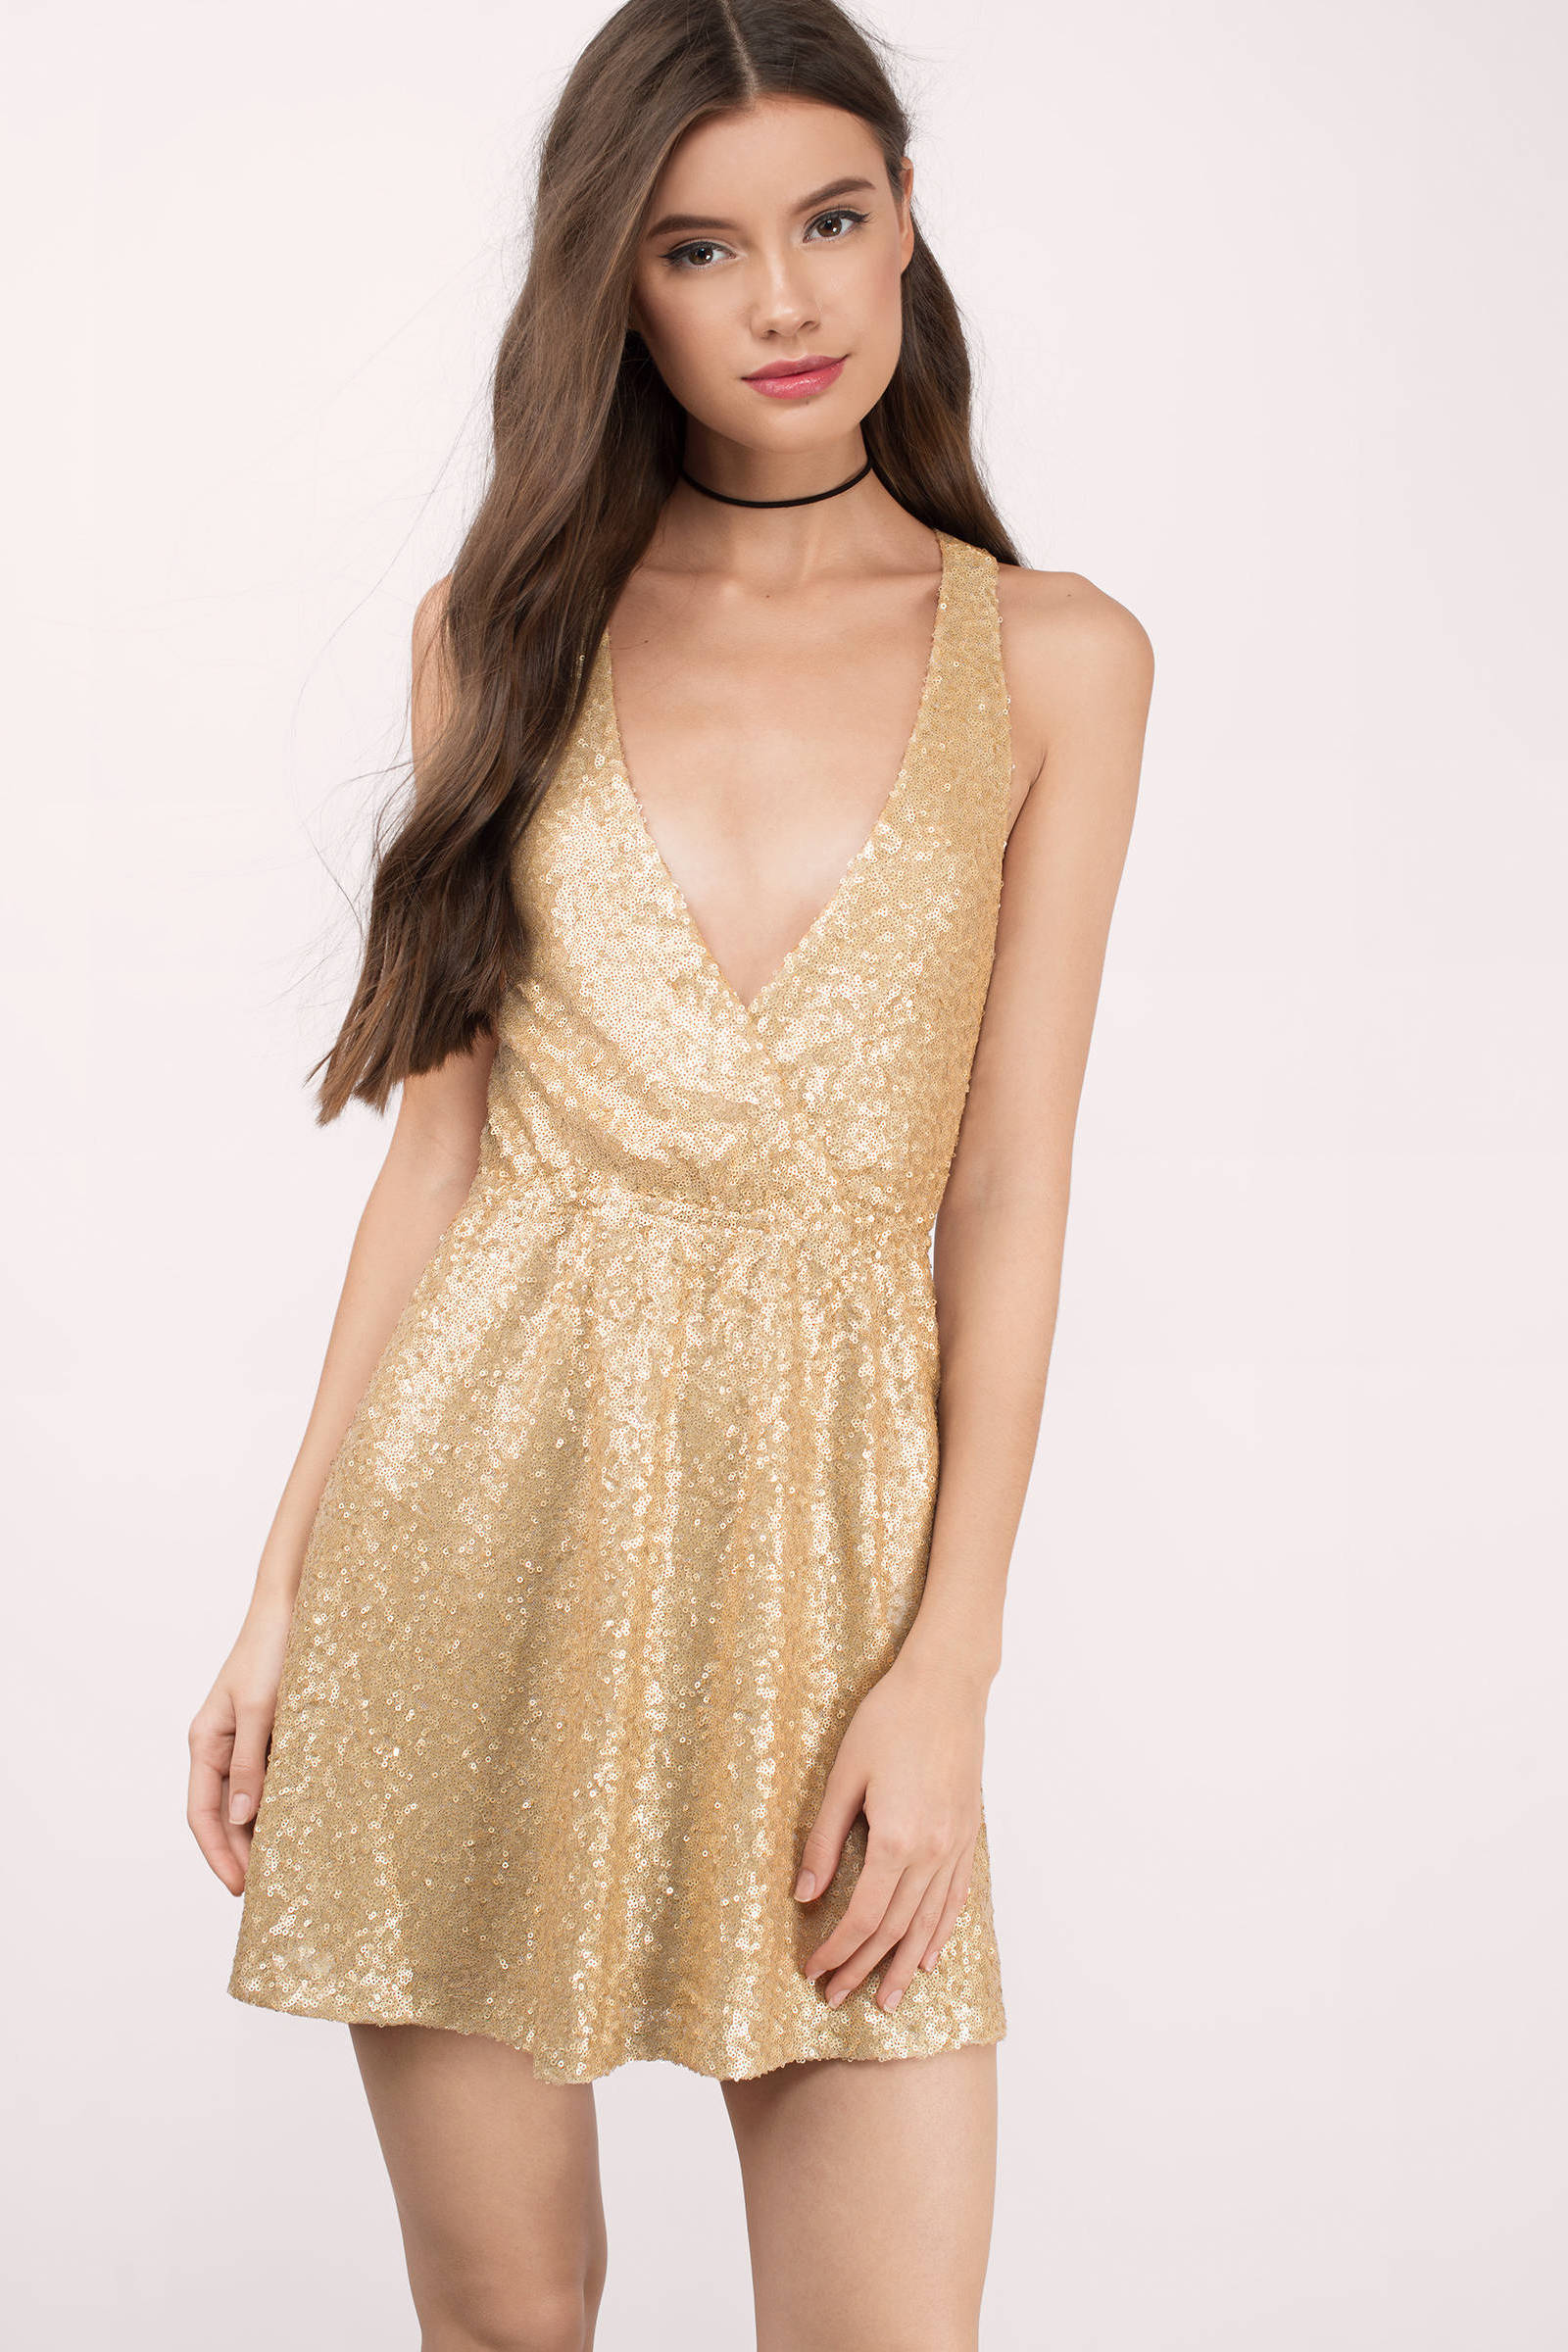 Black dress kisschasy lyrics - Gold Skater Dress